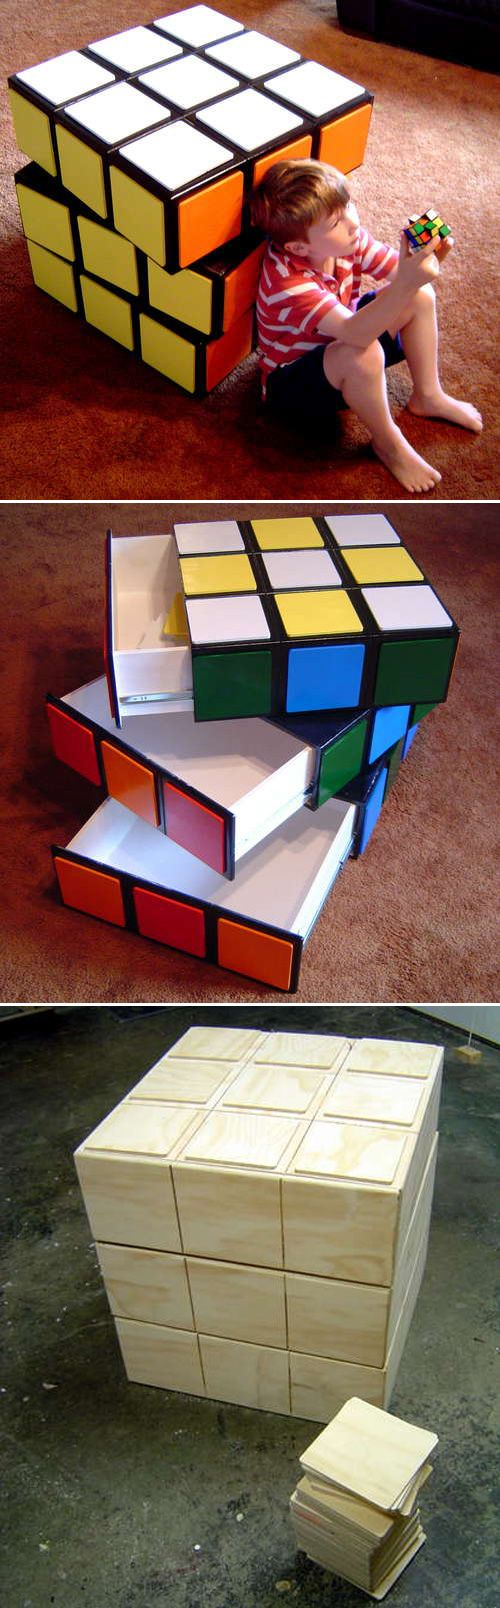 Awesome game room storage bin! Cubo di Rubik porta giochi